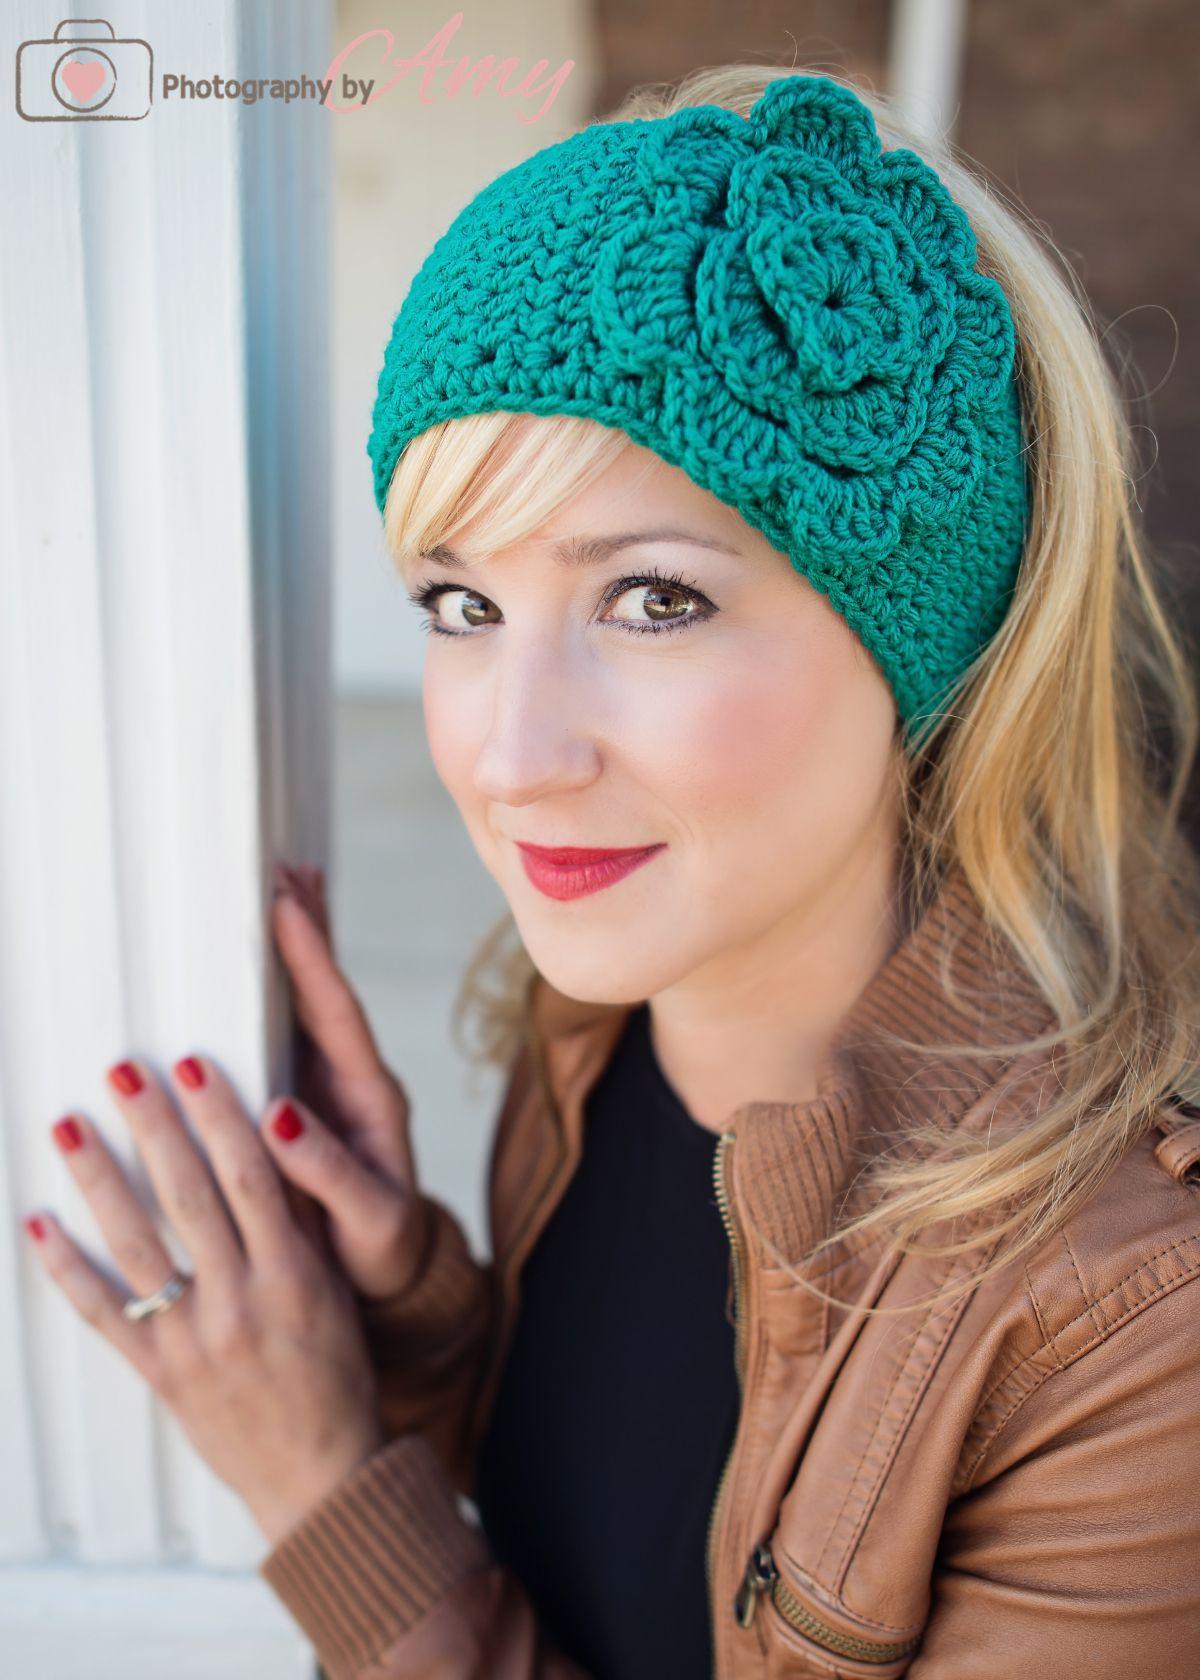 Crochet headband -fast and easy to make! | DIY Crafts | Pinterest ...